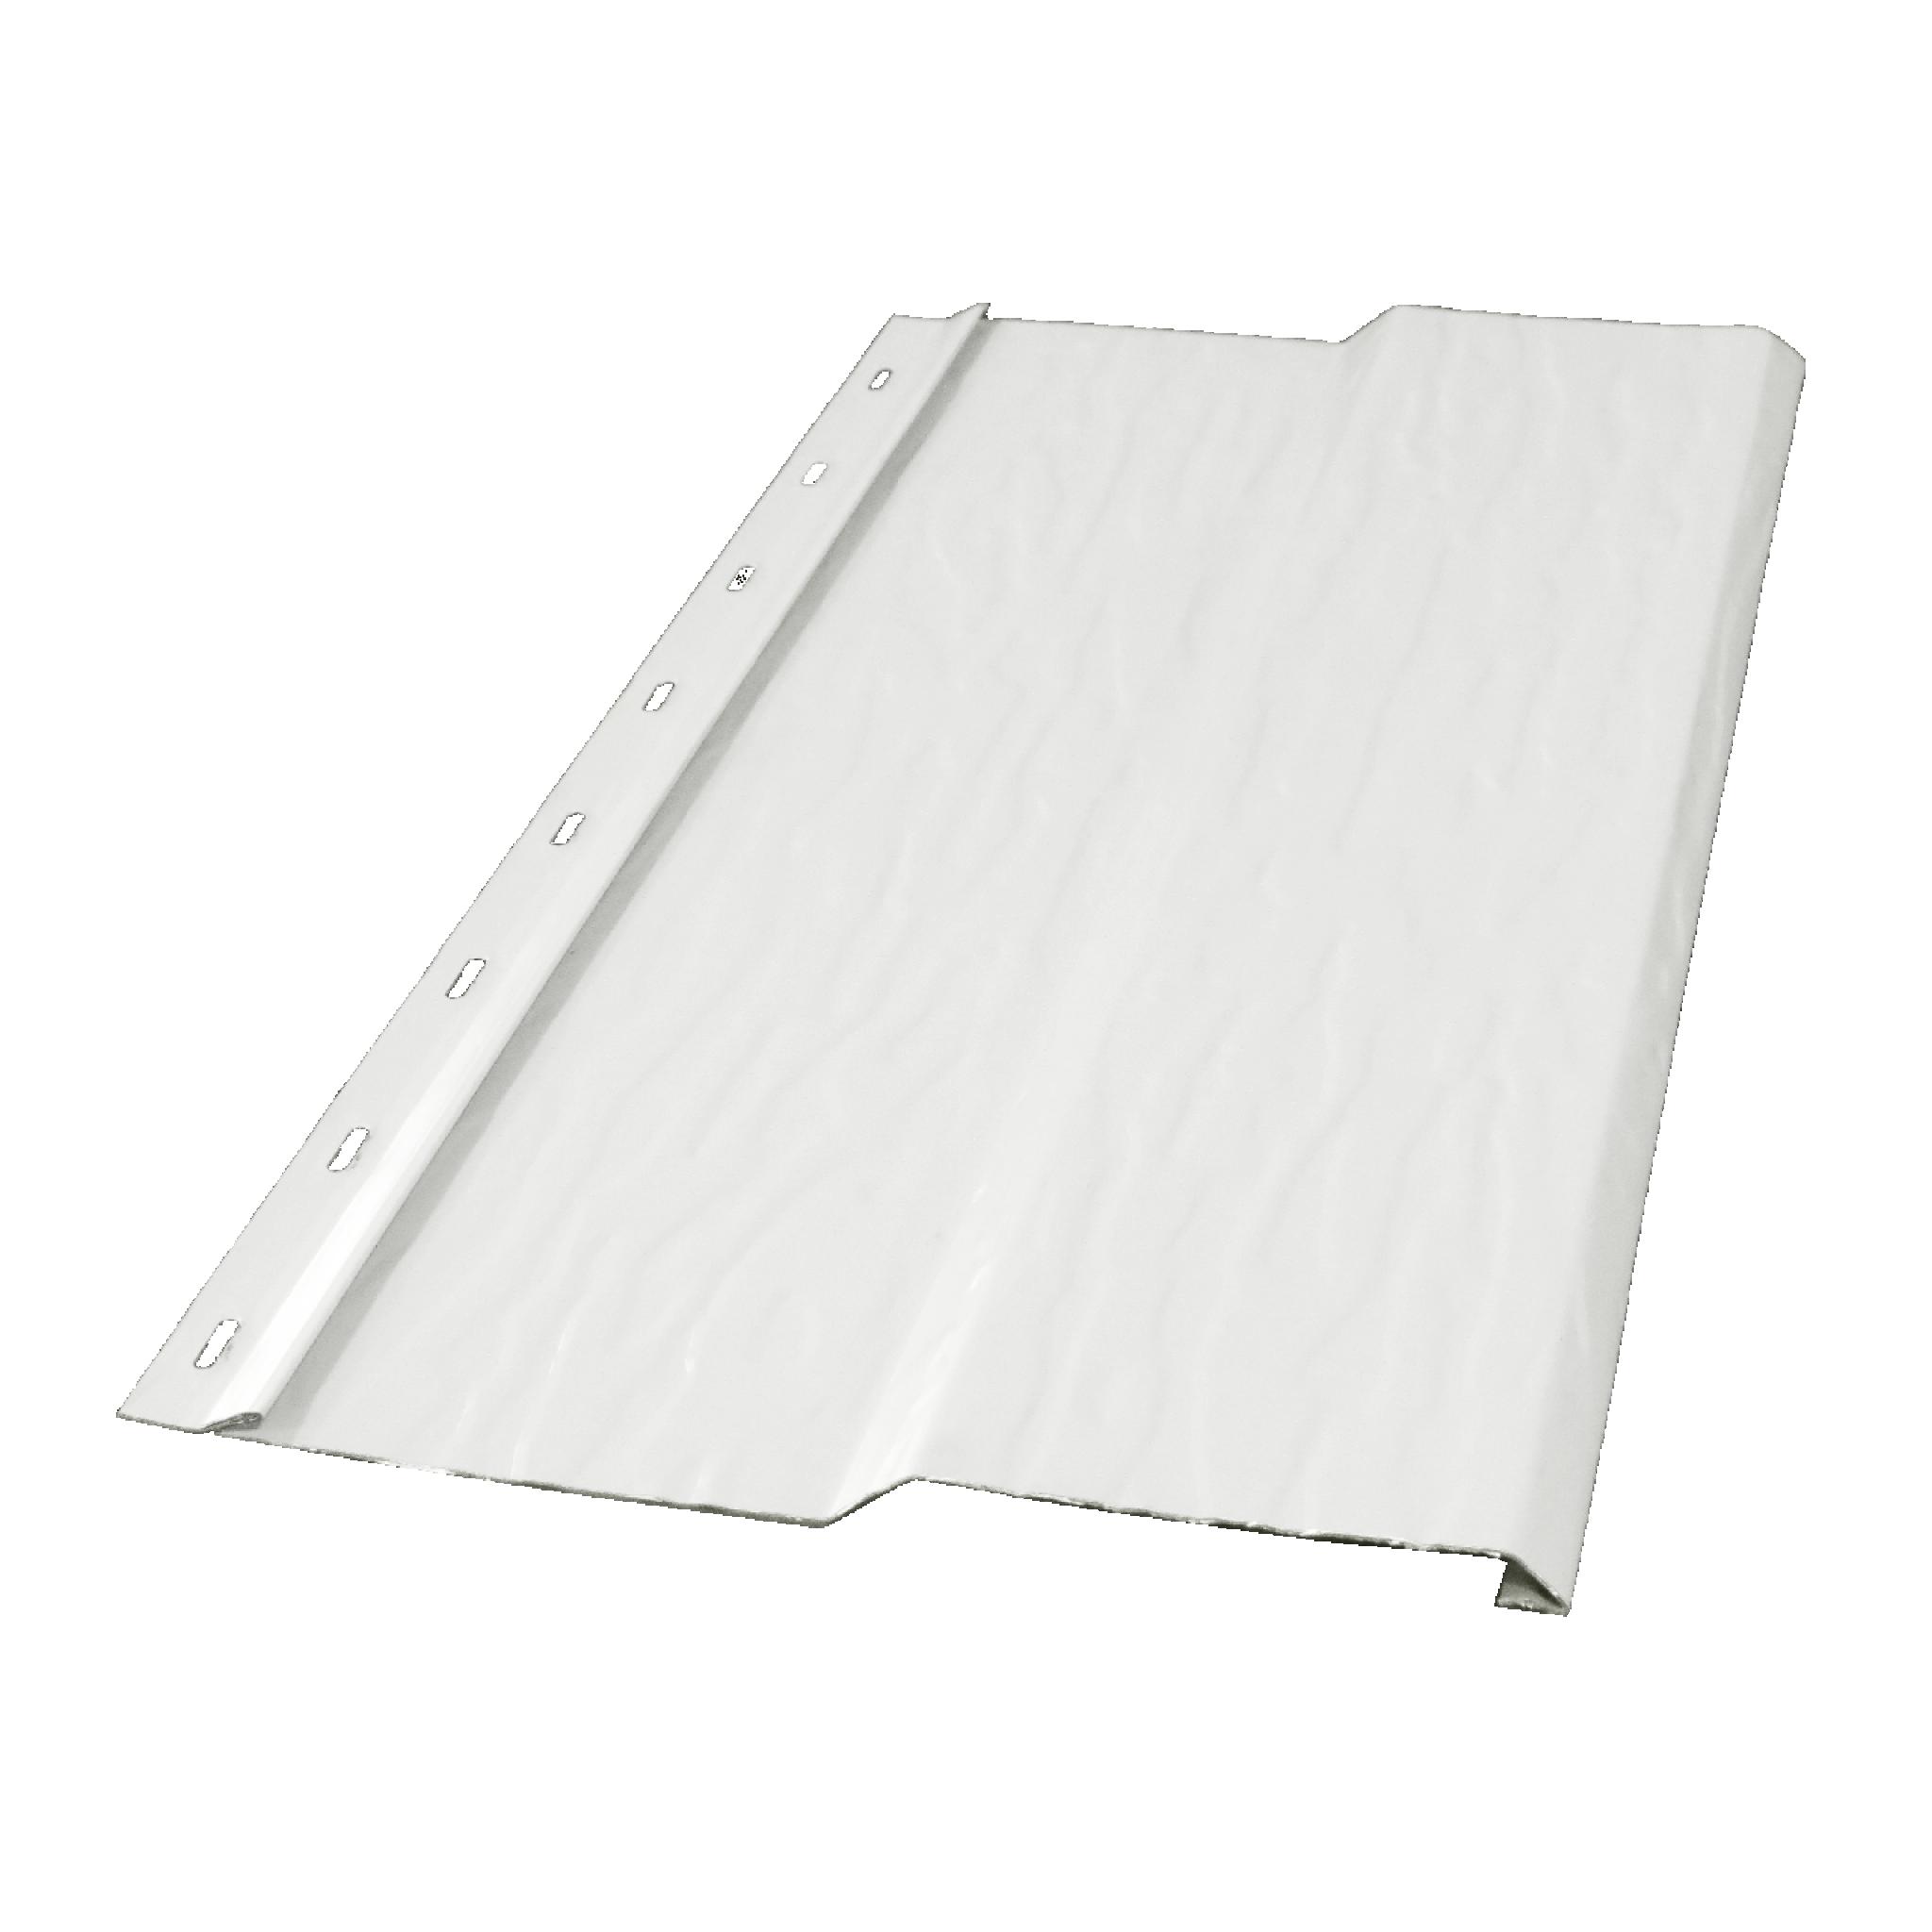 V-190 Vertical Aluminum Siding